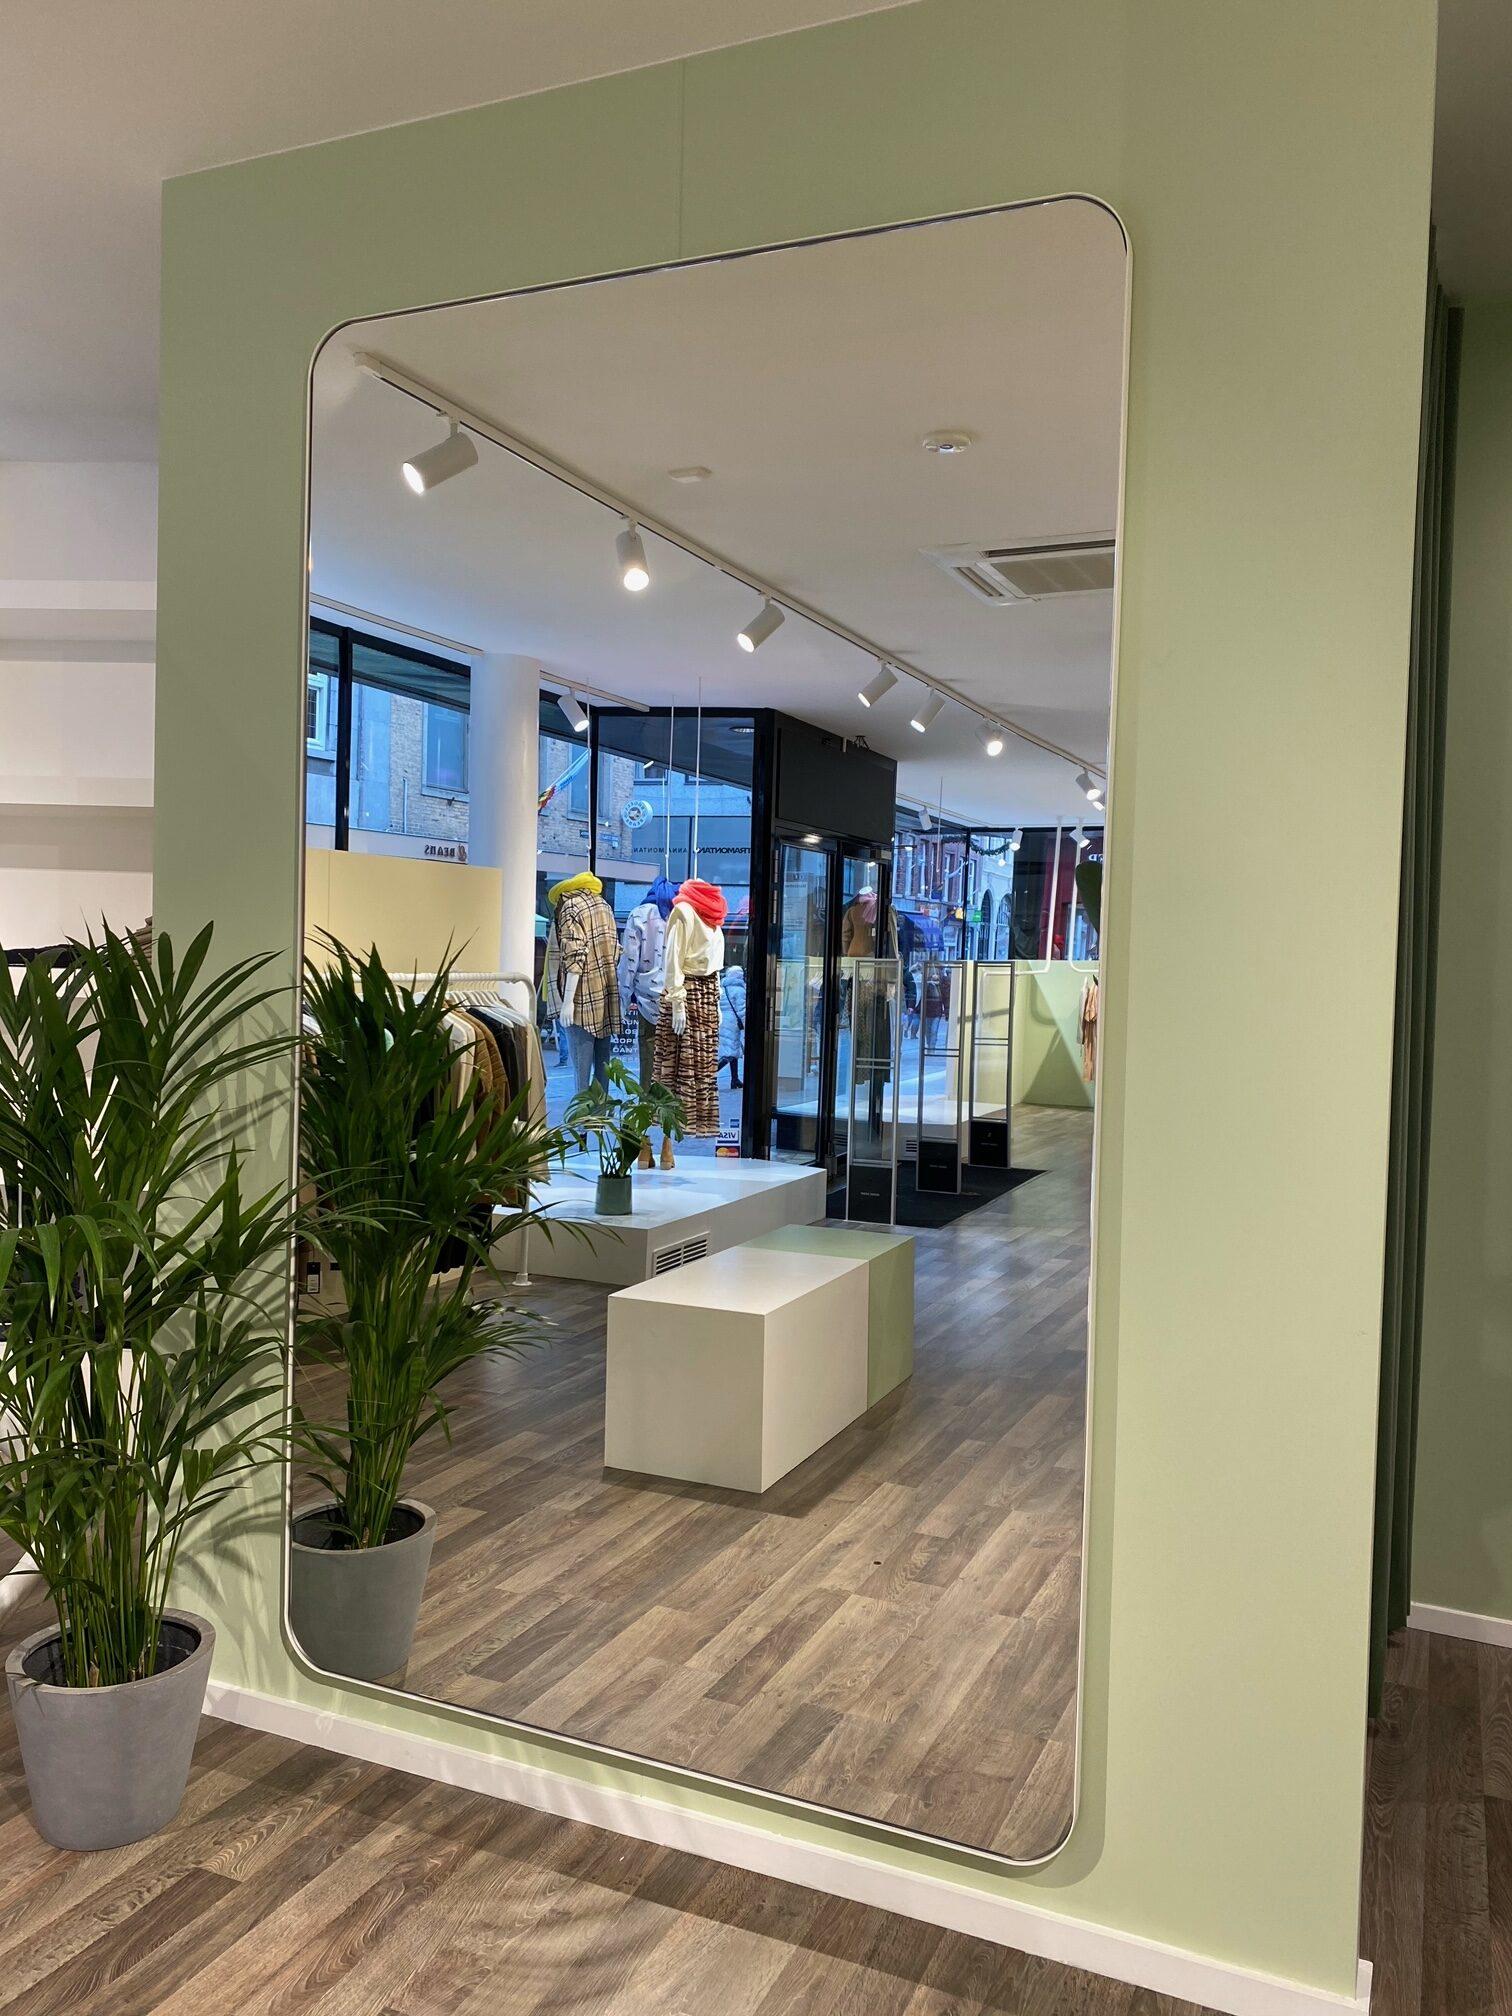 passpiegel winkel winkelinterieur inrichting kledingwinkel grote spiegel